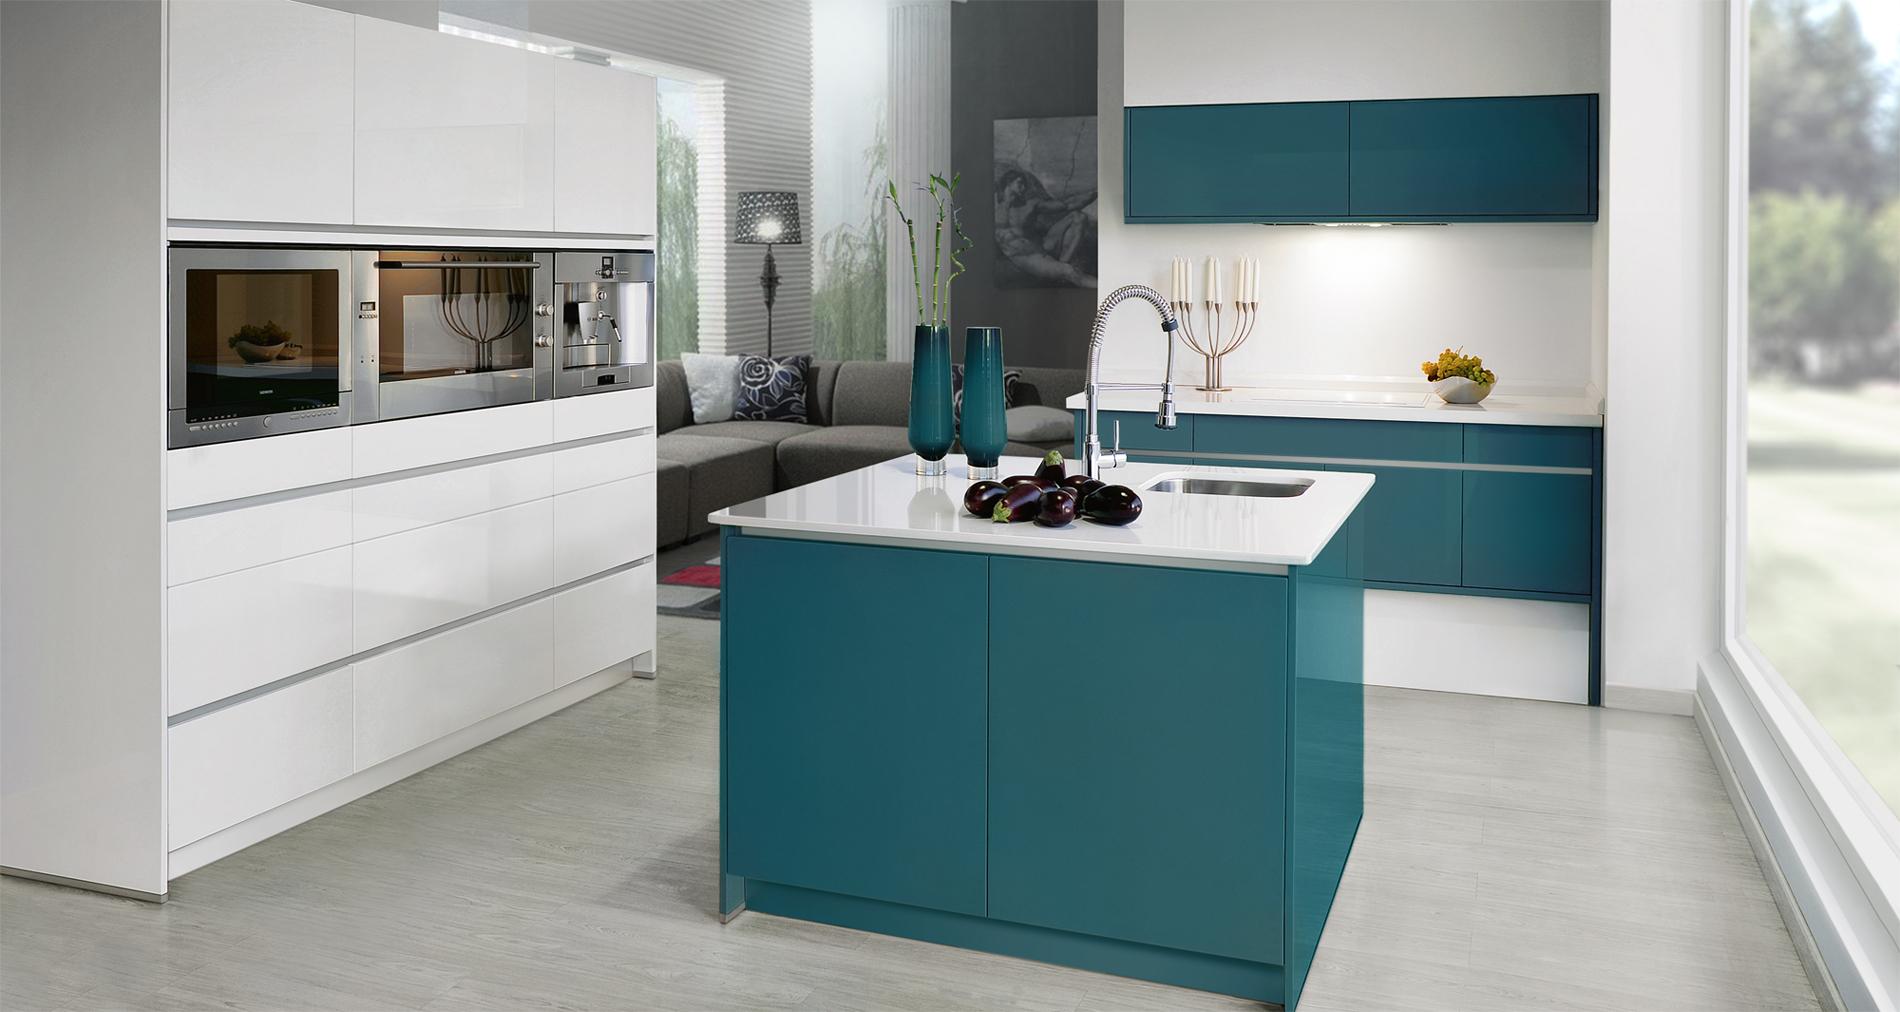 Stunning Muebles De Cocina Leon Pictures - Casa & Diseño Ideas ...